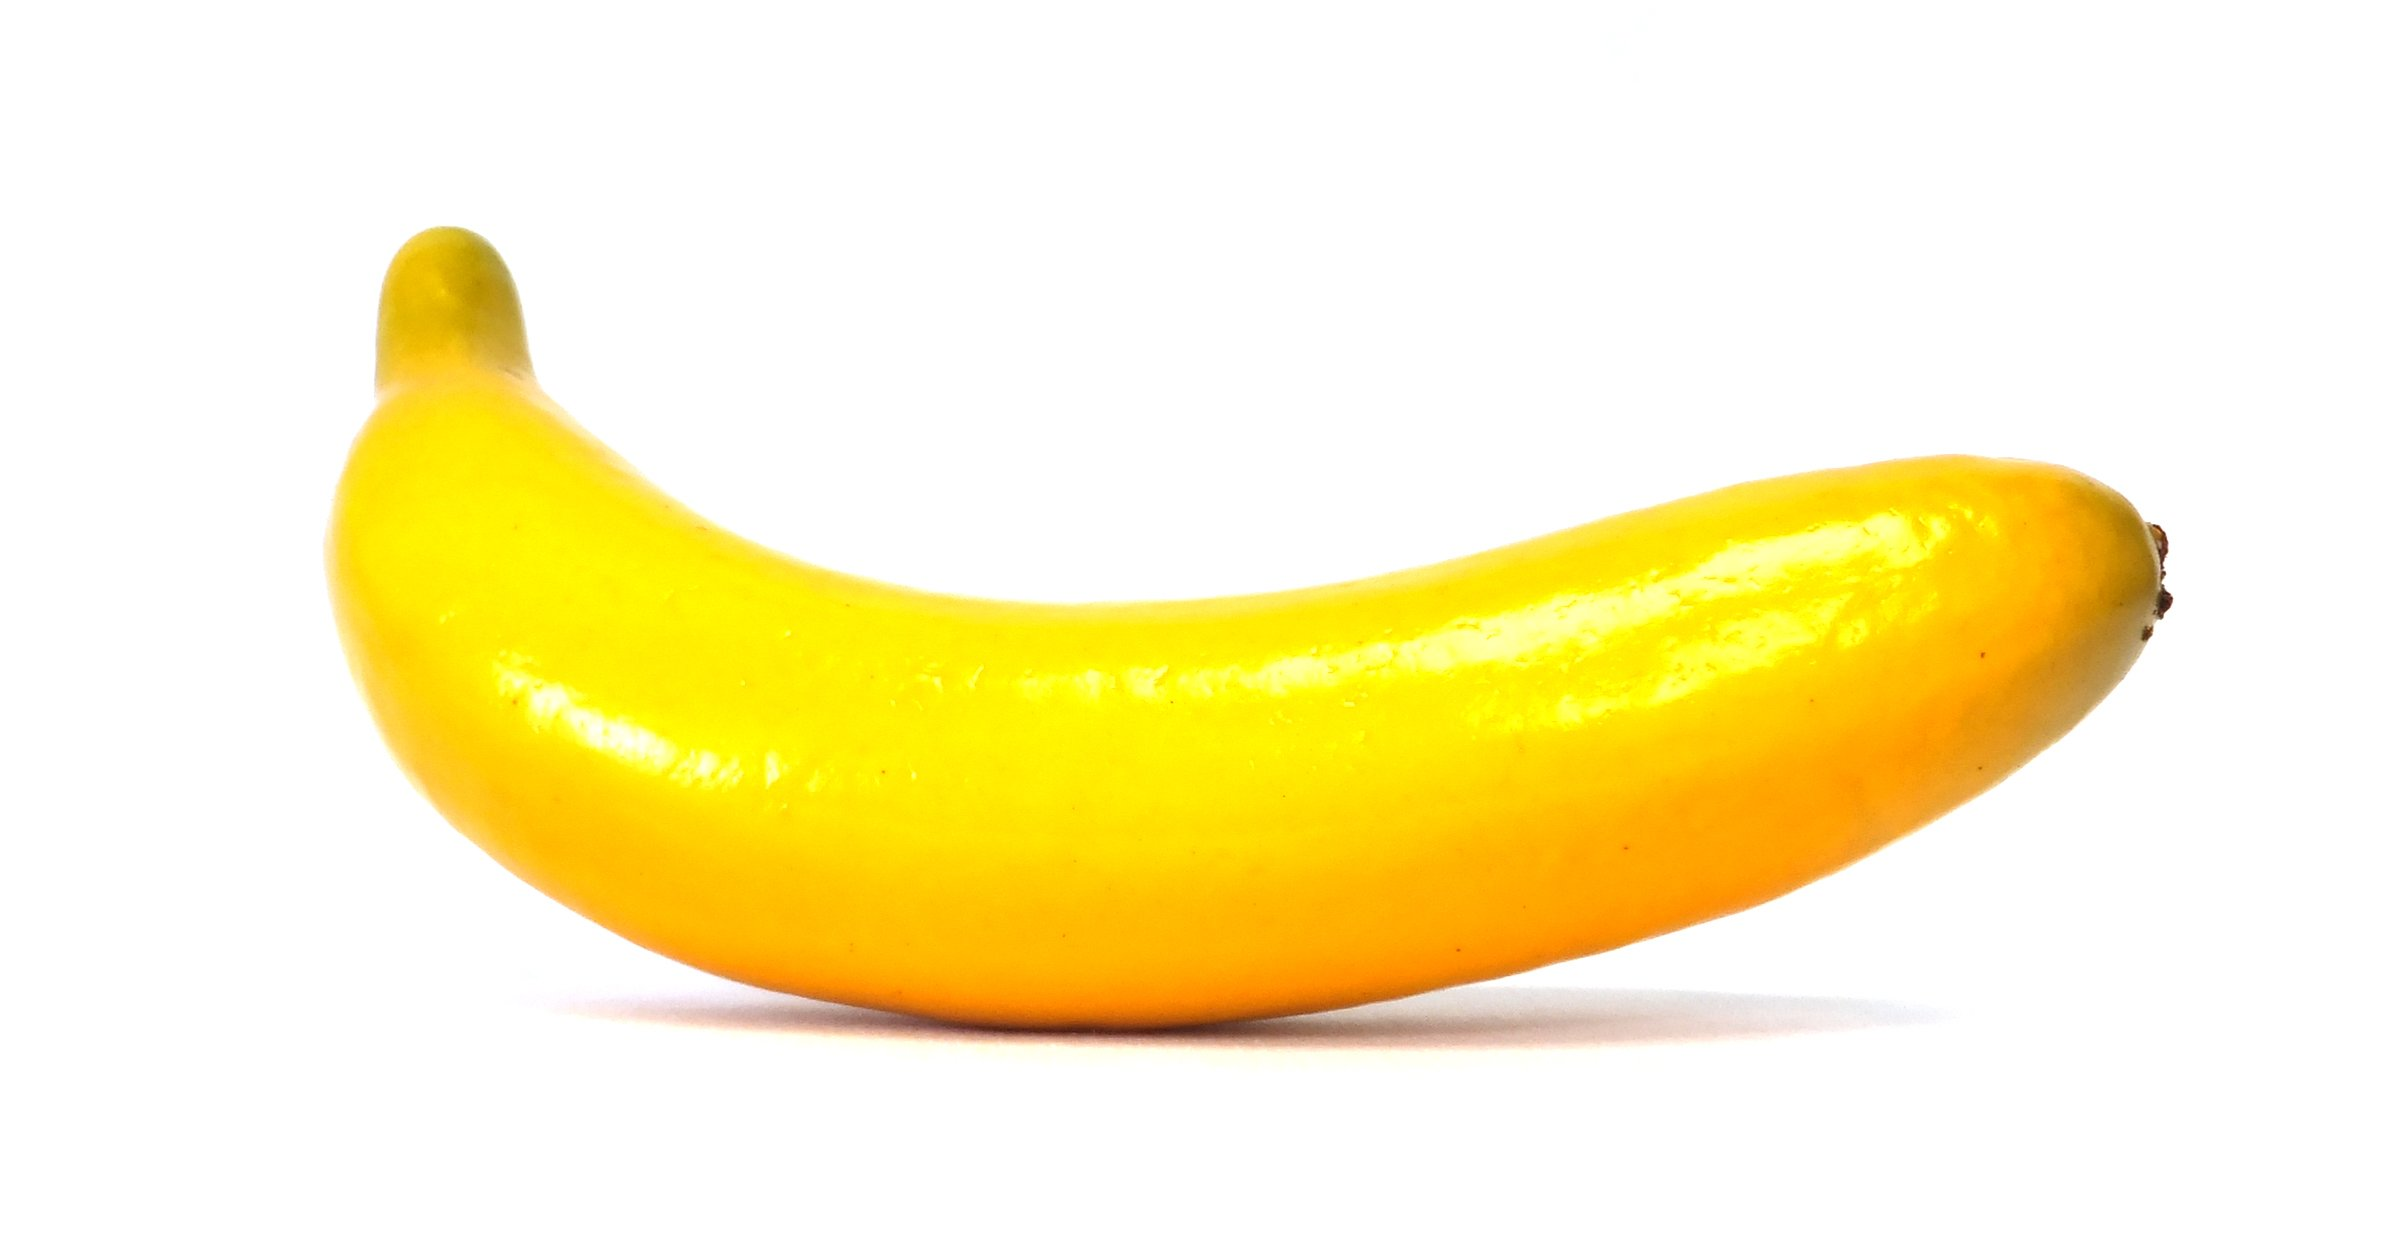 6pc Artificial Banana Bananas - Plastic Yellow Decorative Fruit - Six Pieces by Viabella (Image #2)